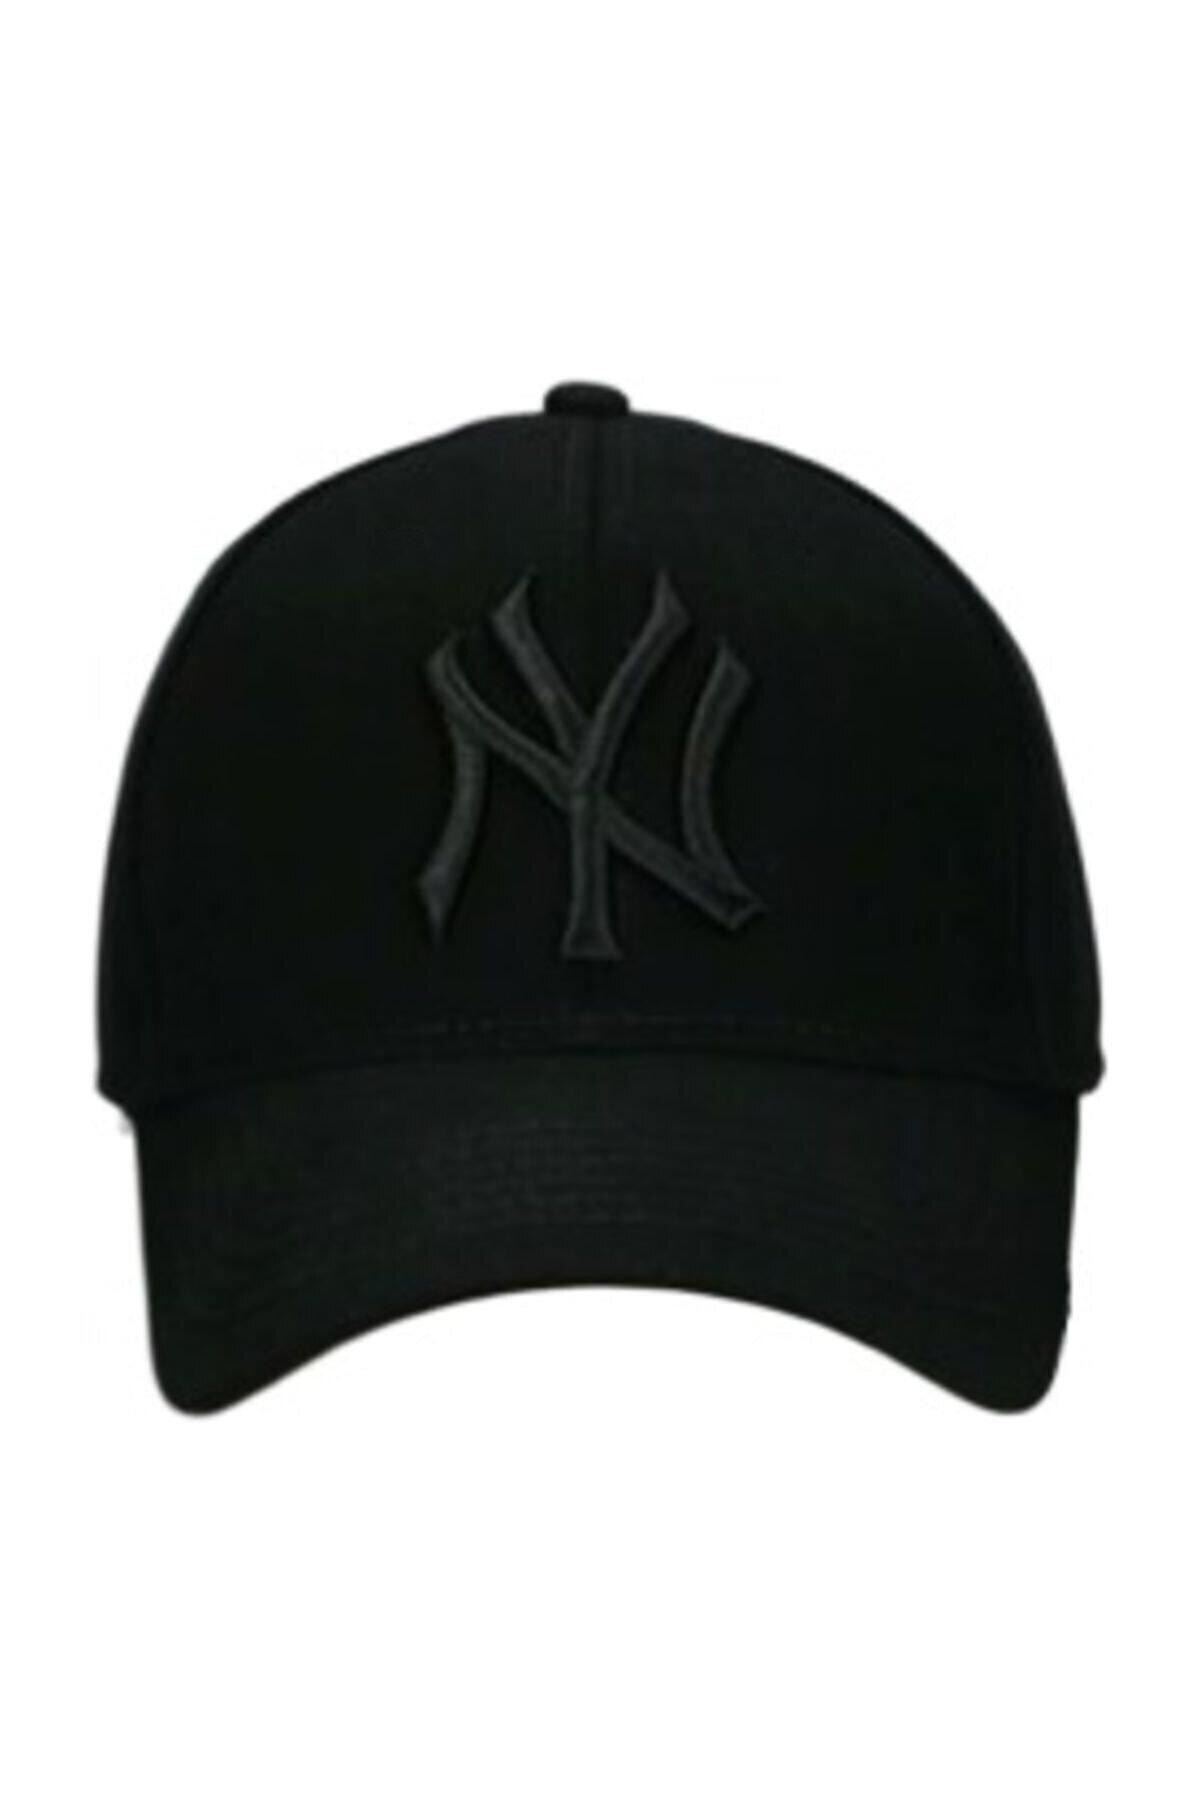 NuxFah Ny New York Şapka Unisex Siyah Şapka 1